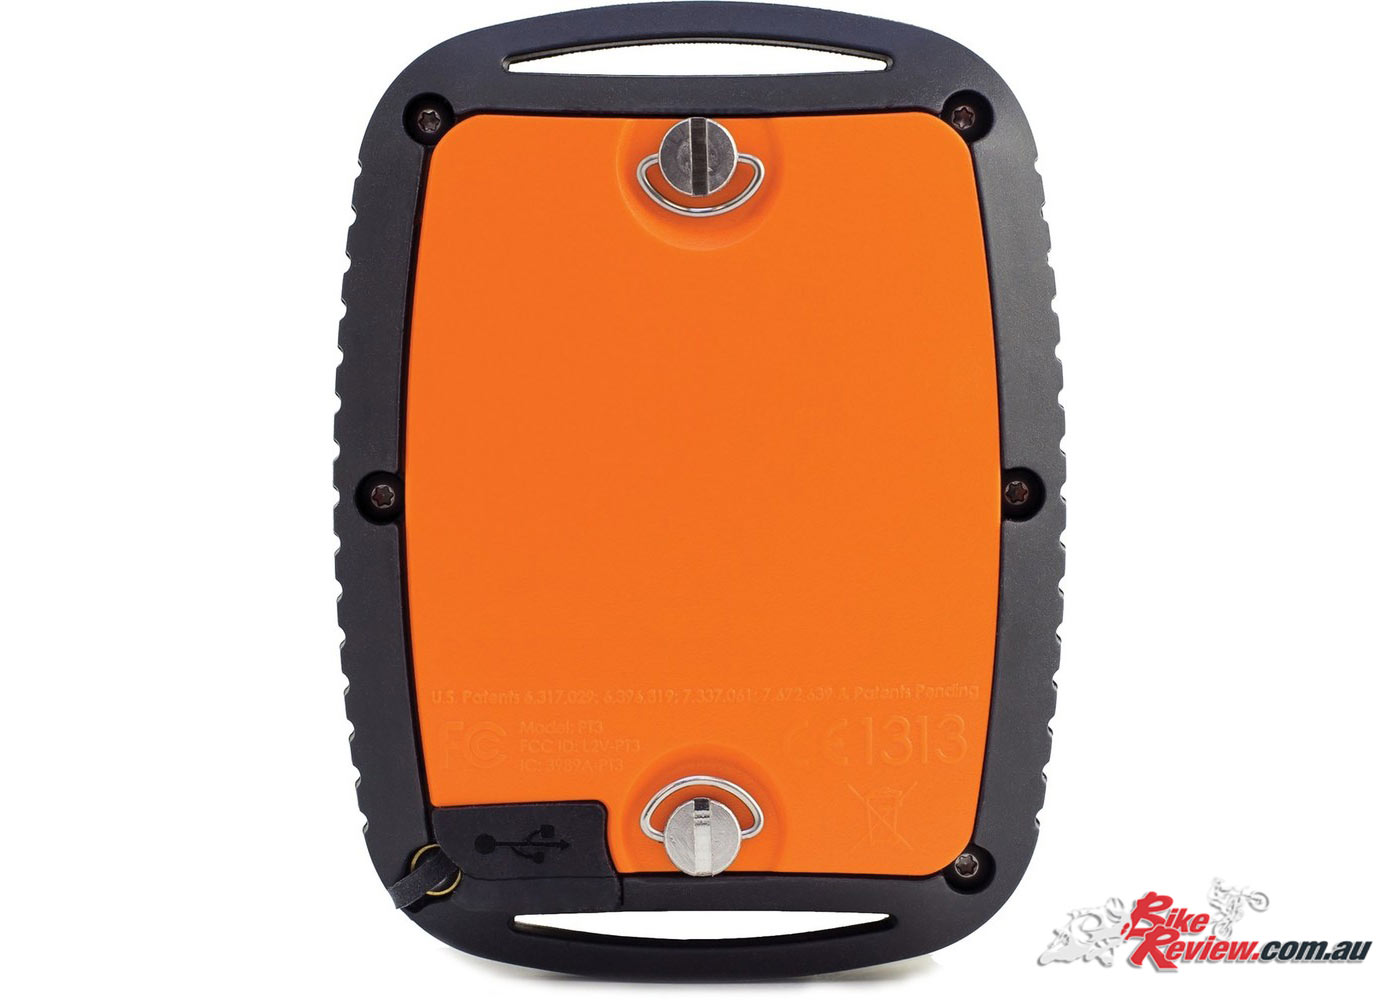 SPOT Gen3 Satelitte GPS Messenger